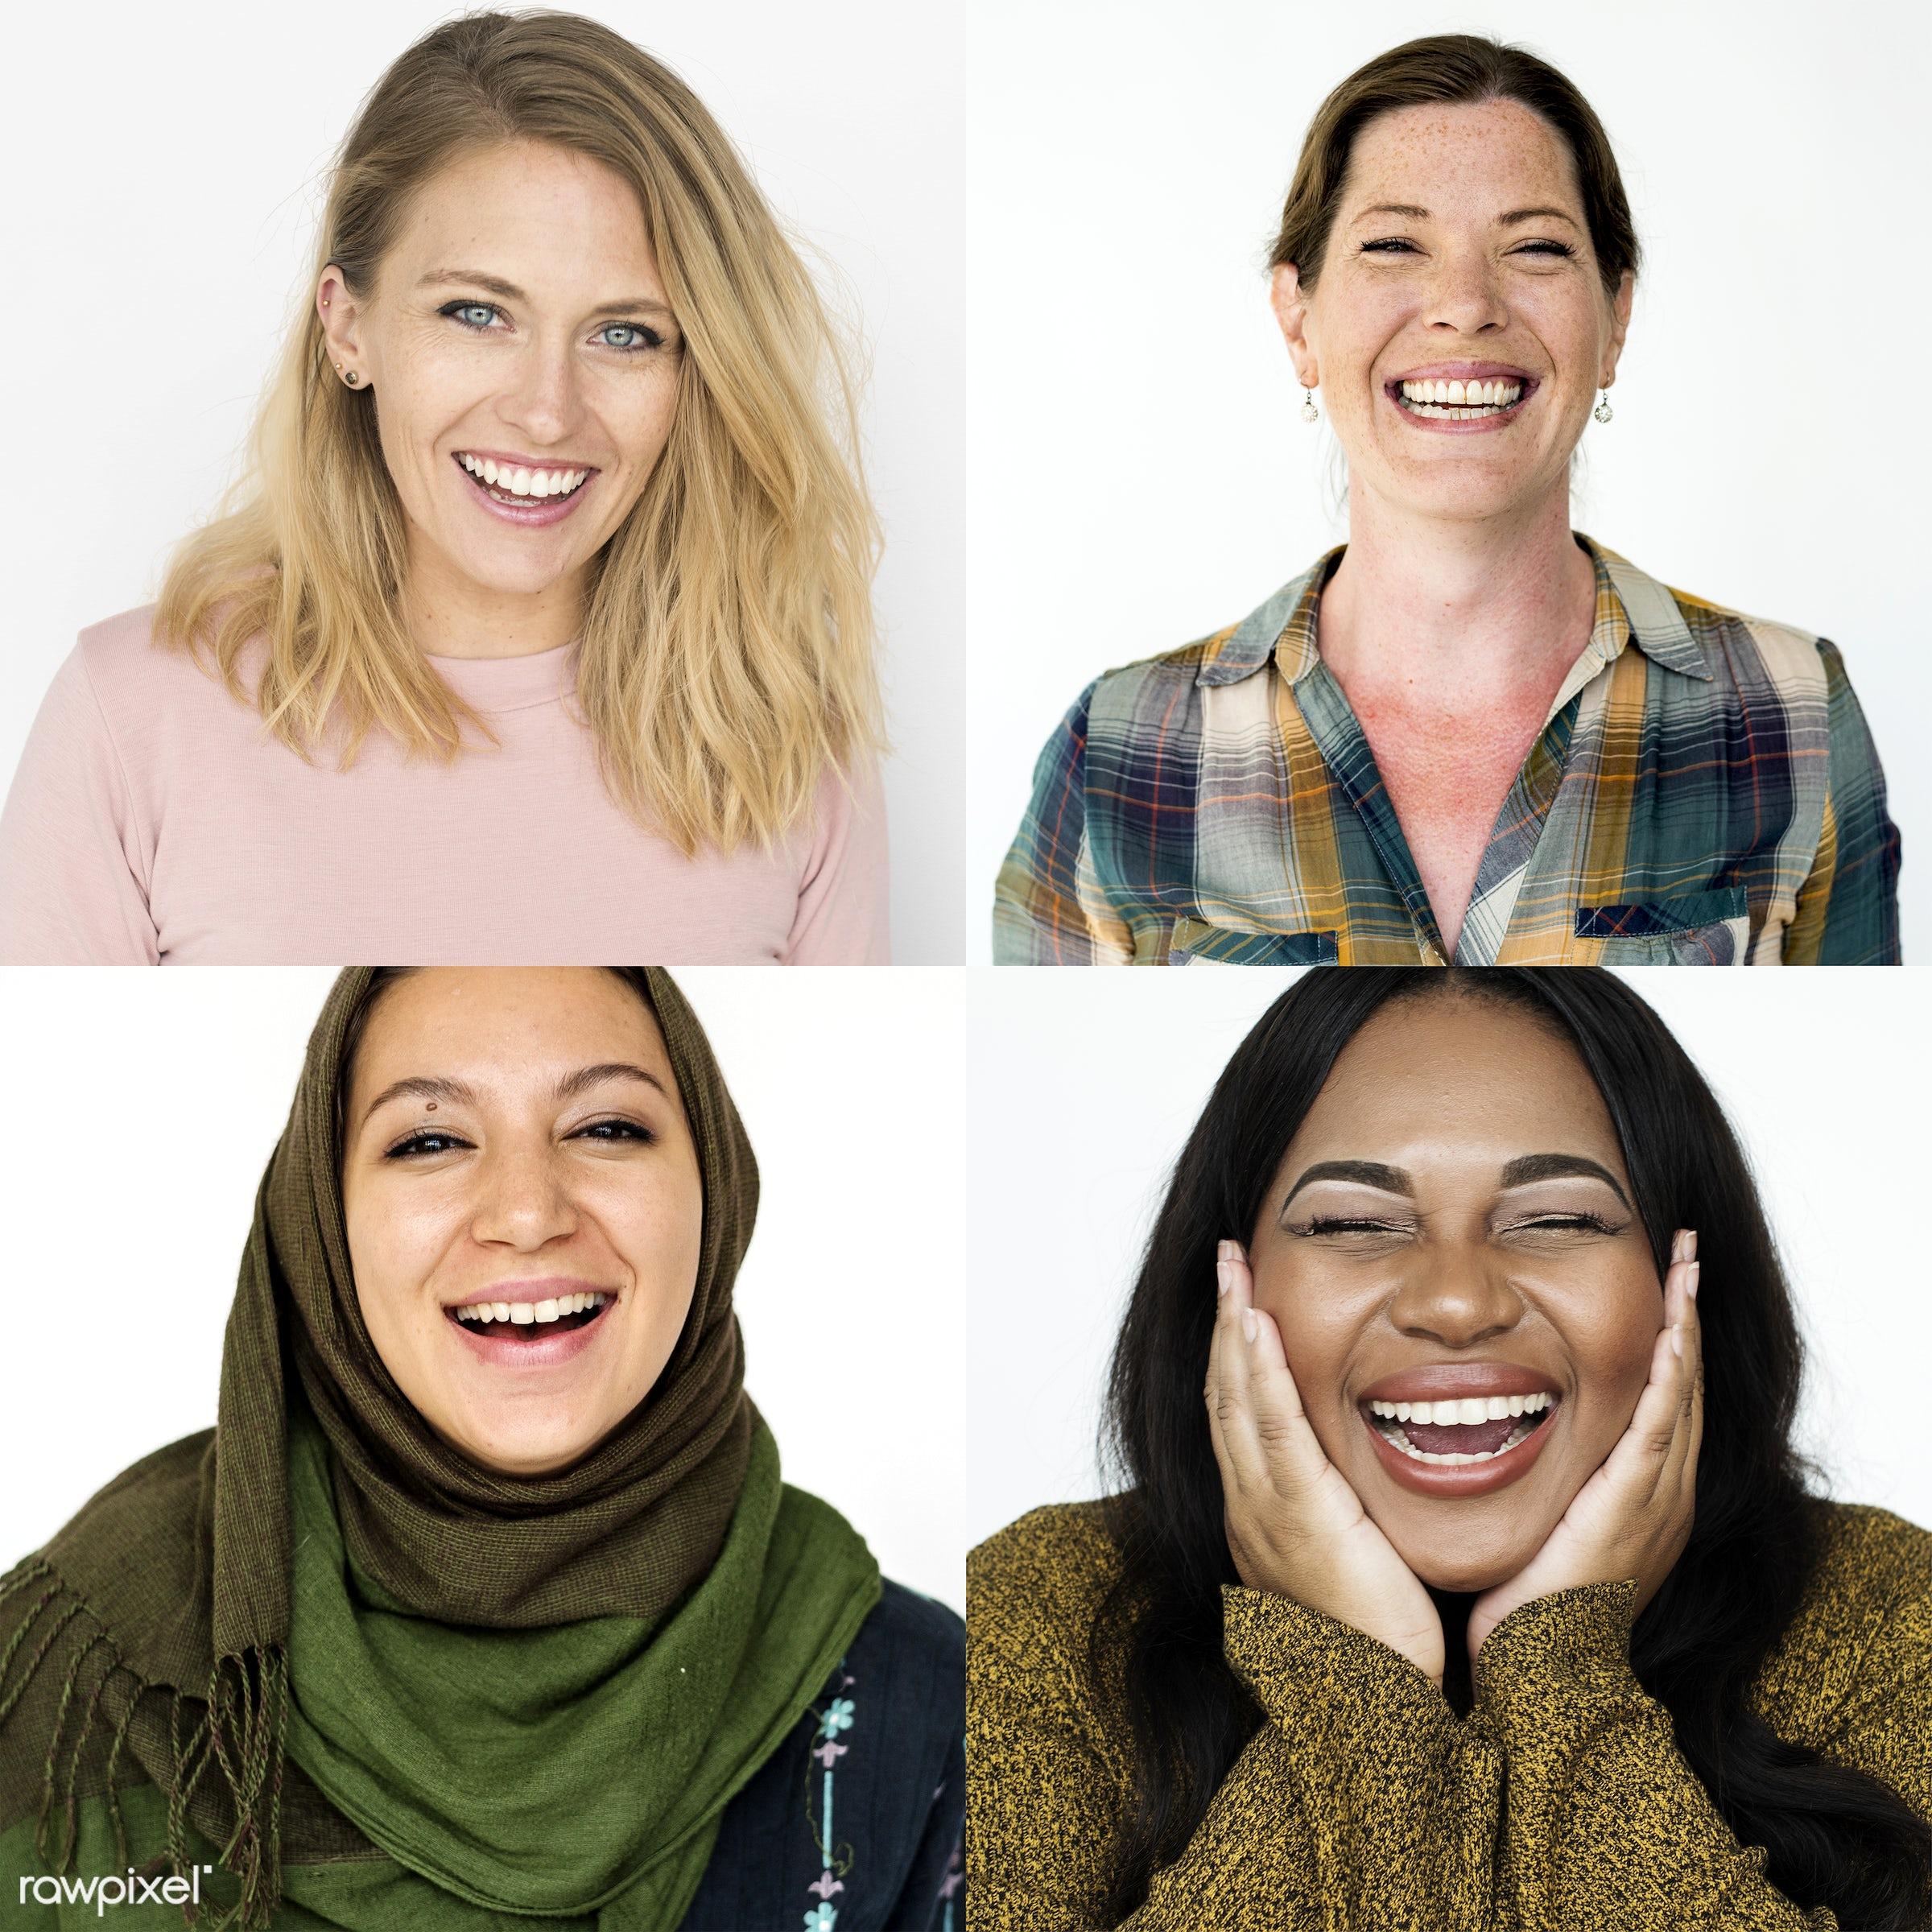 muslim, studio, bright, set, variation, collection, optimistic, people, positivity, caucasian, face expression, woman,...